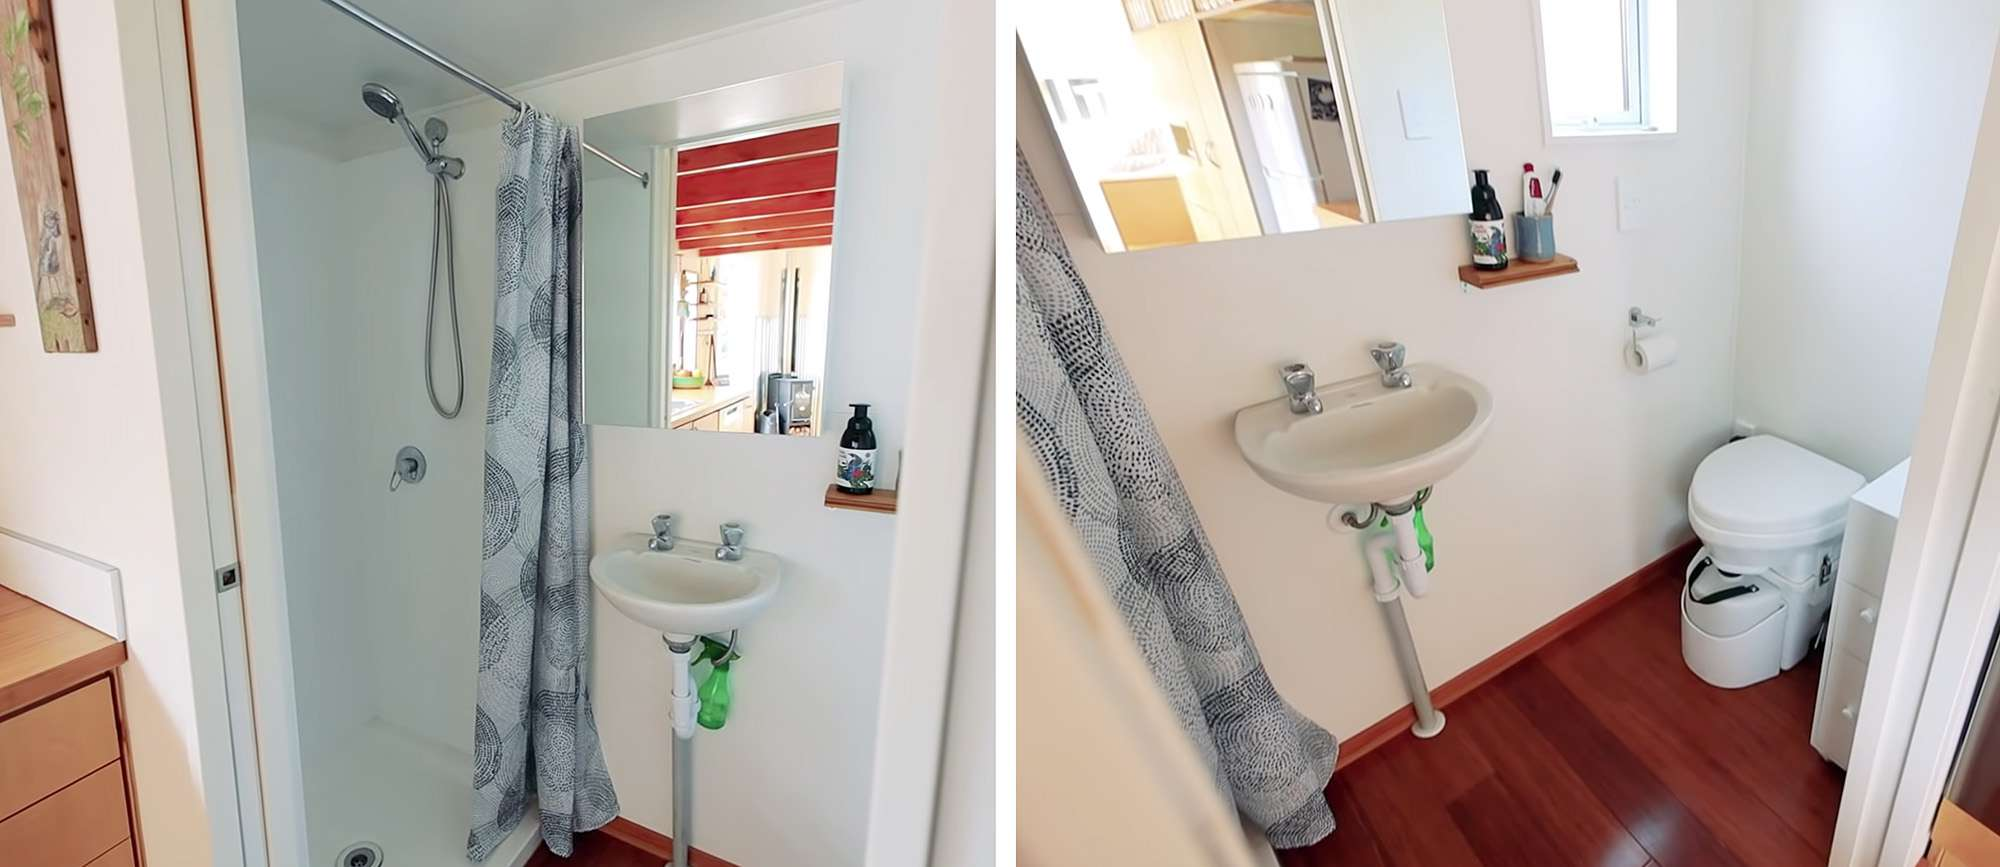 tiny house with movie loft Living Big In A Tiny House bathroom